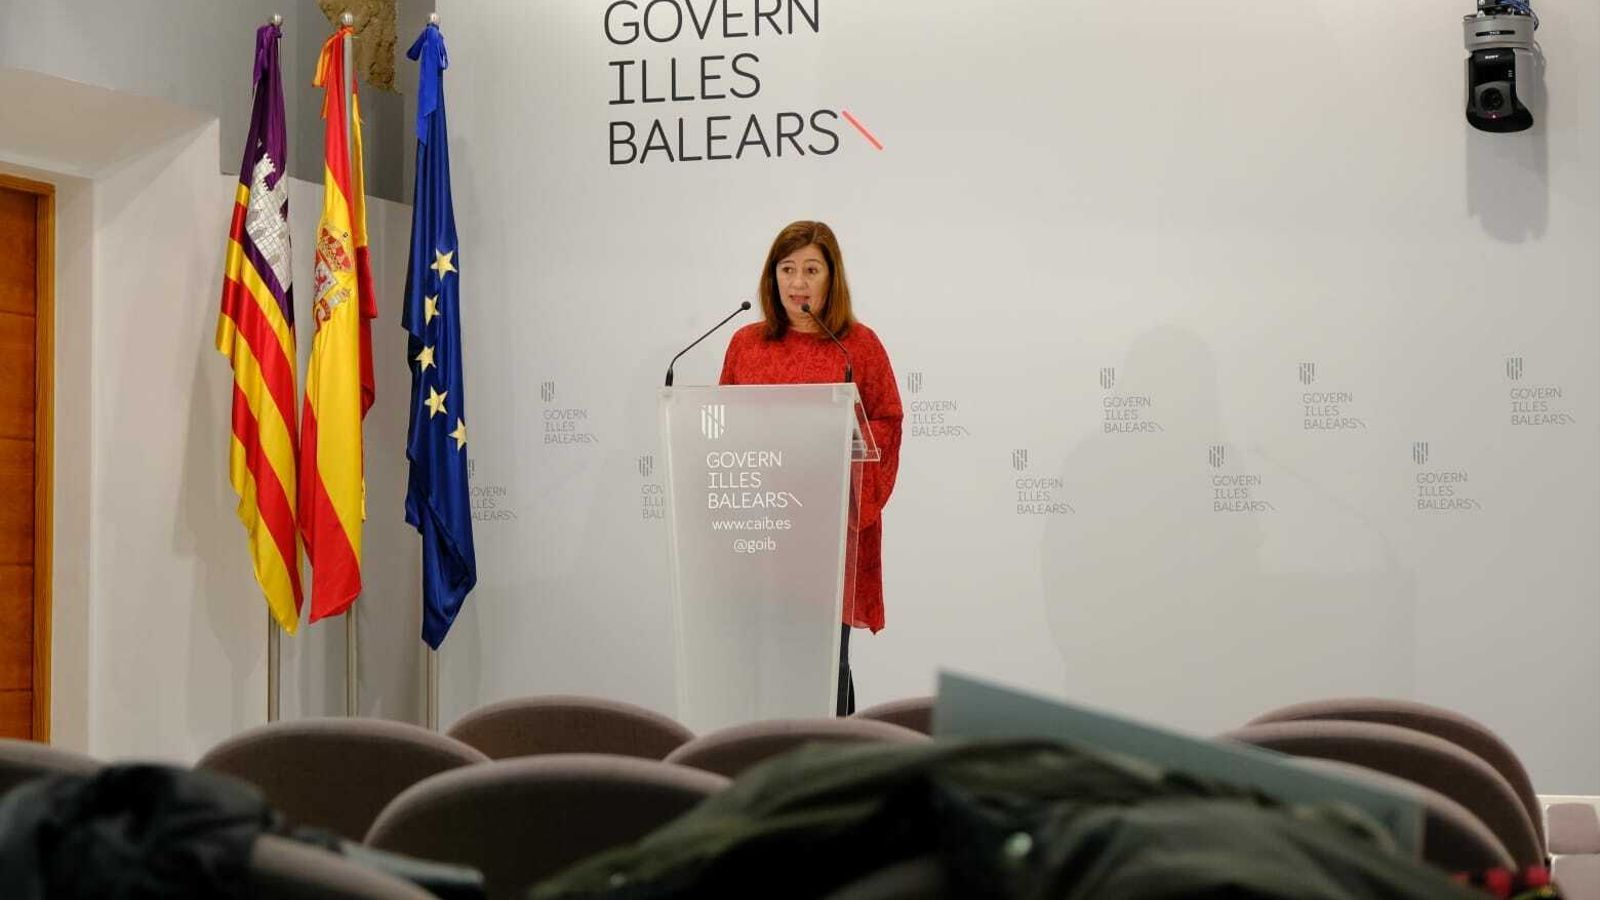 La presidenta del Govern de les Illes Balears durant la roda de premsa.